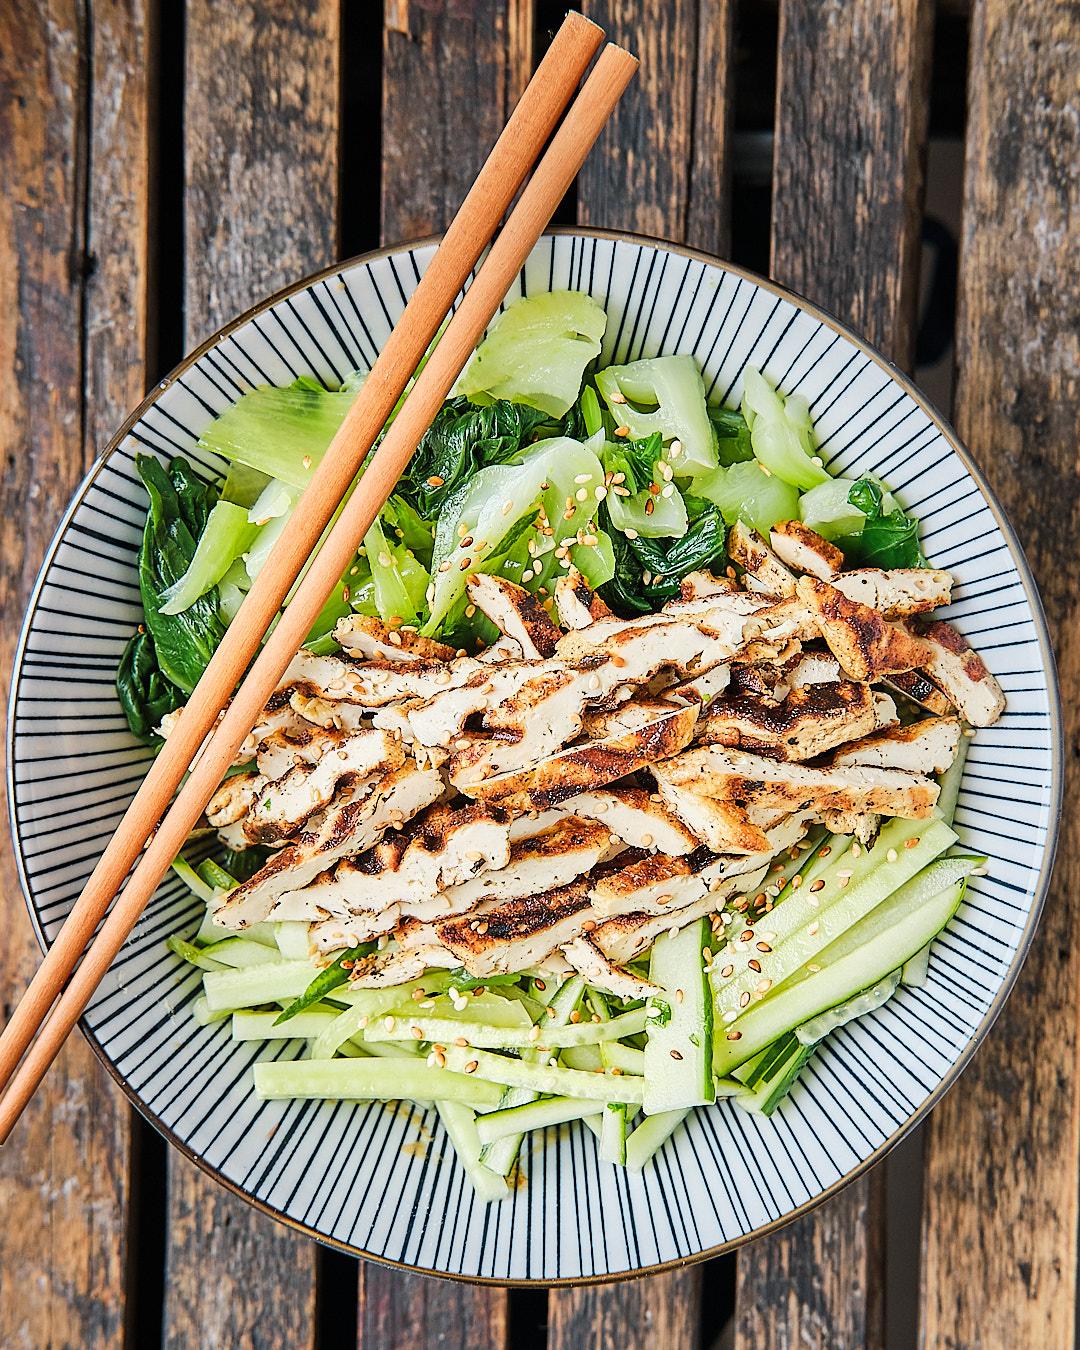 Kalte Salatbowl mit gegrilltem Tofu, Gurke, Pakchoi in Sesamsoße